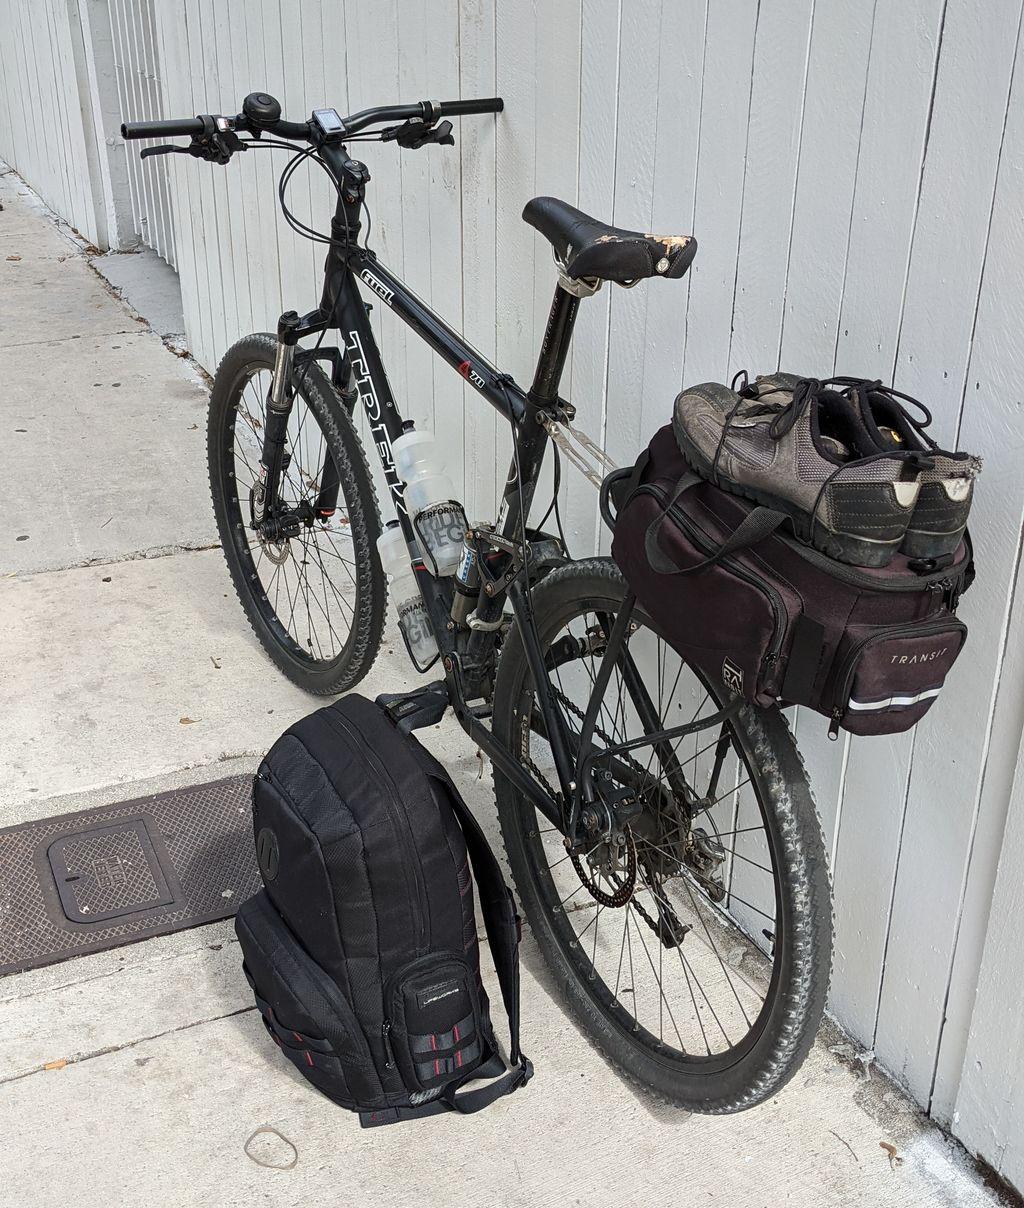 Trek Fuel 70 loaded up